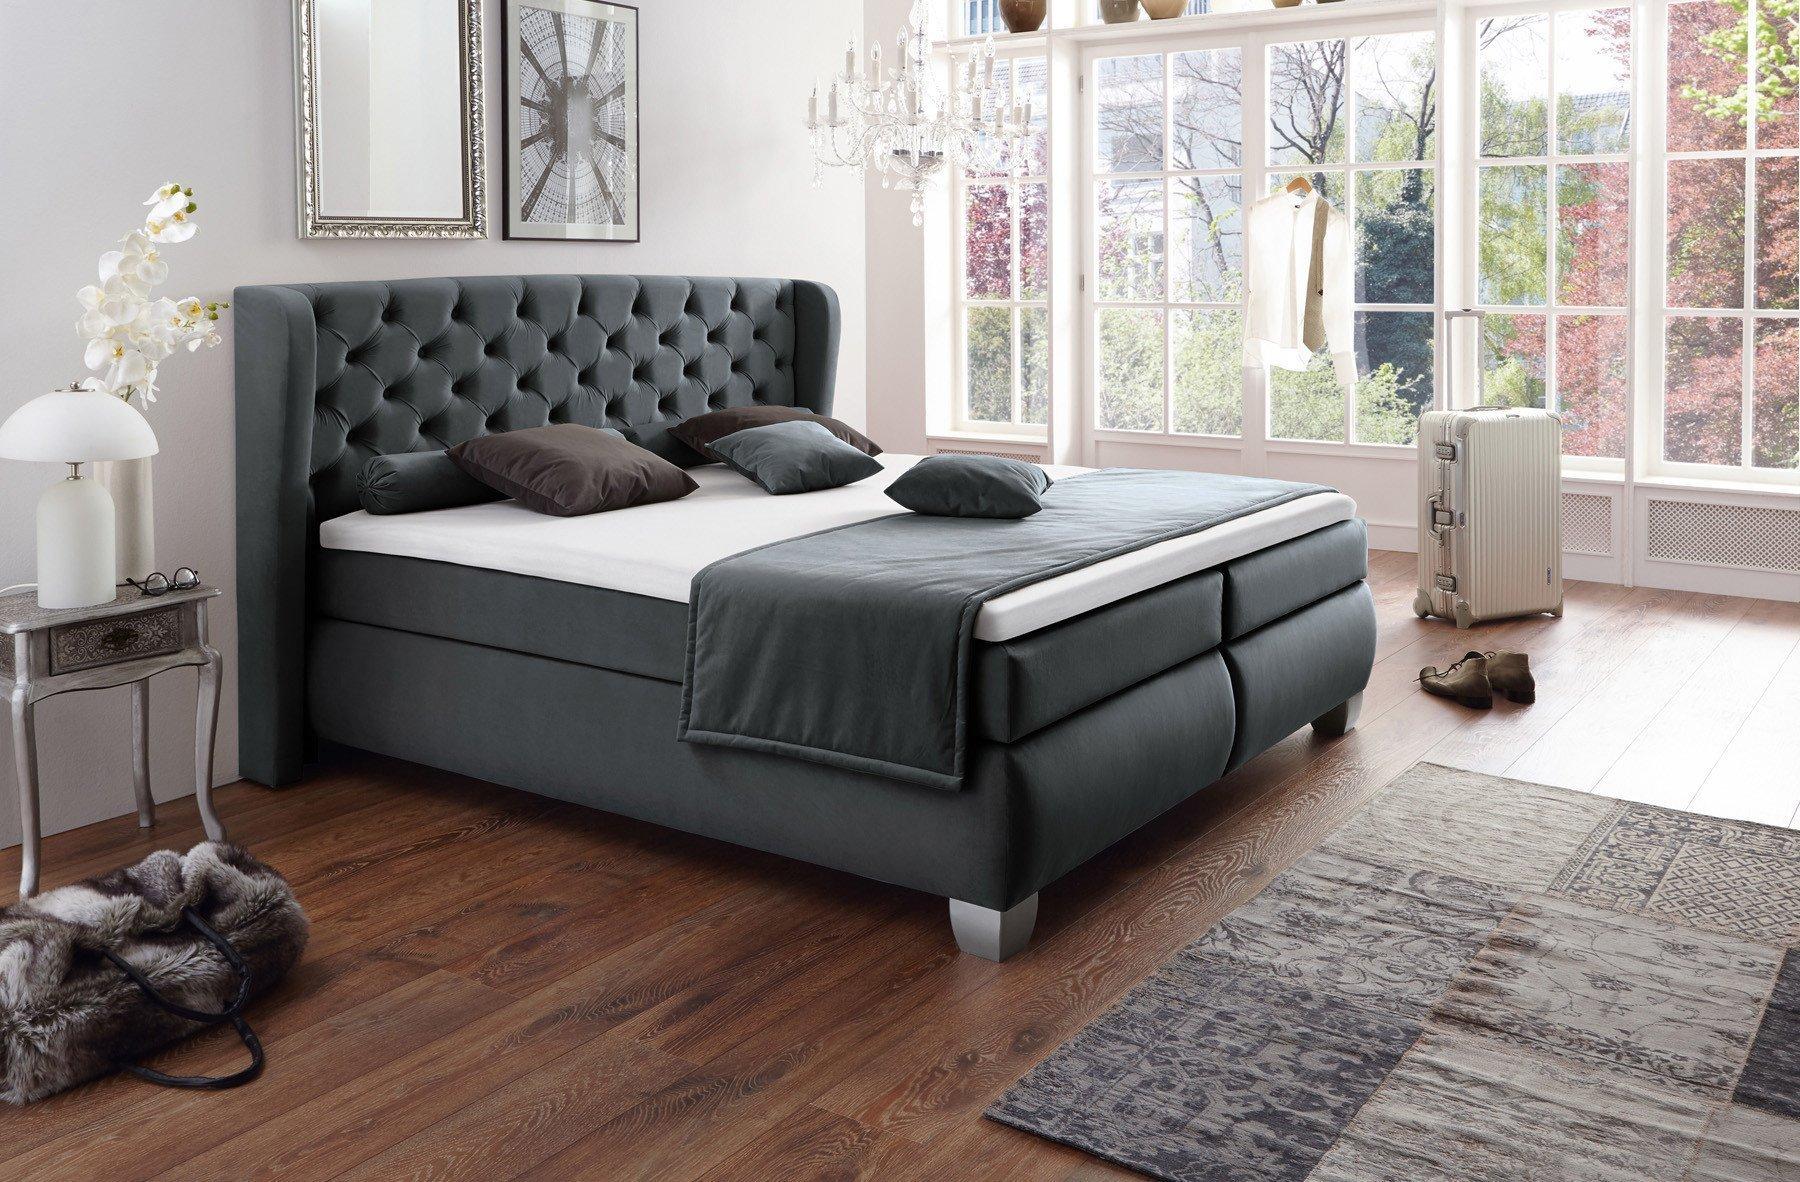 boxspringbett chester von hapo mit knopfheftung in. Black Bedroom Furniture Sets. Home Design Ideas